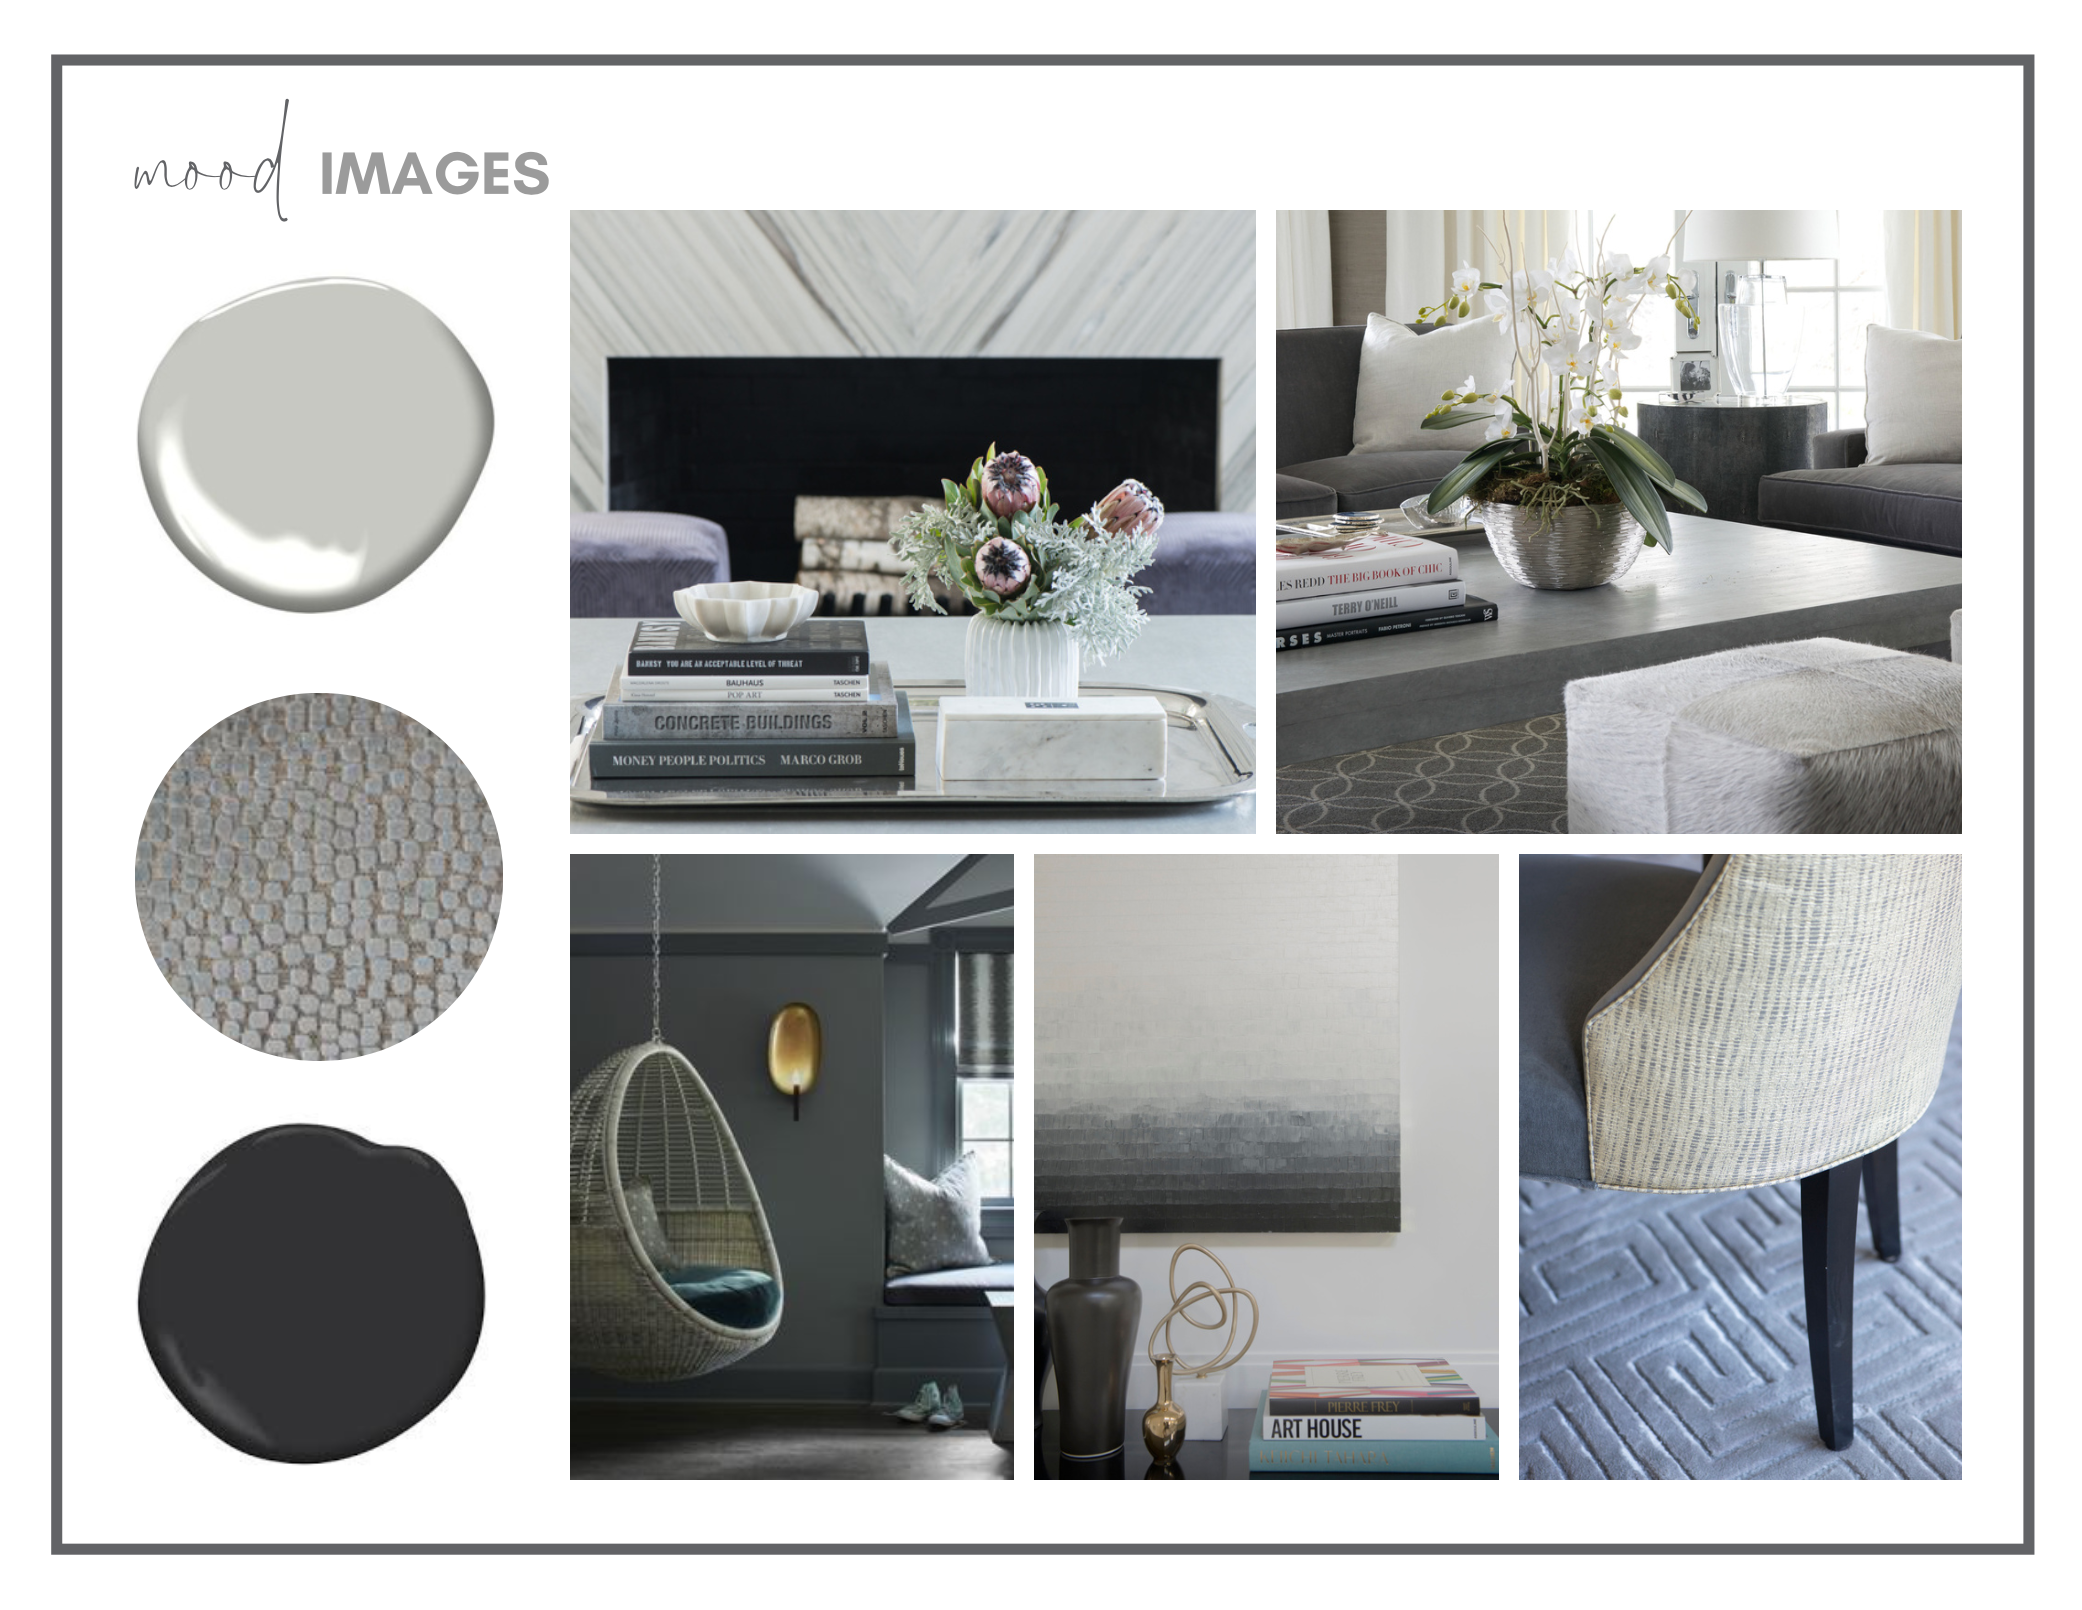 DHNY-Chappaqua-NYC-Contemporary-Modern-Refined-Luxury-Interior-Design-Renovation-Full-Service-7